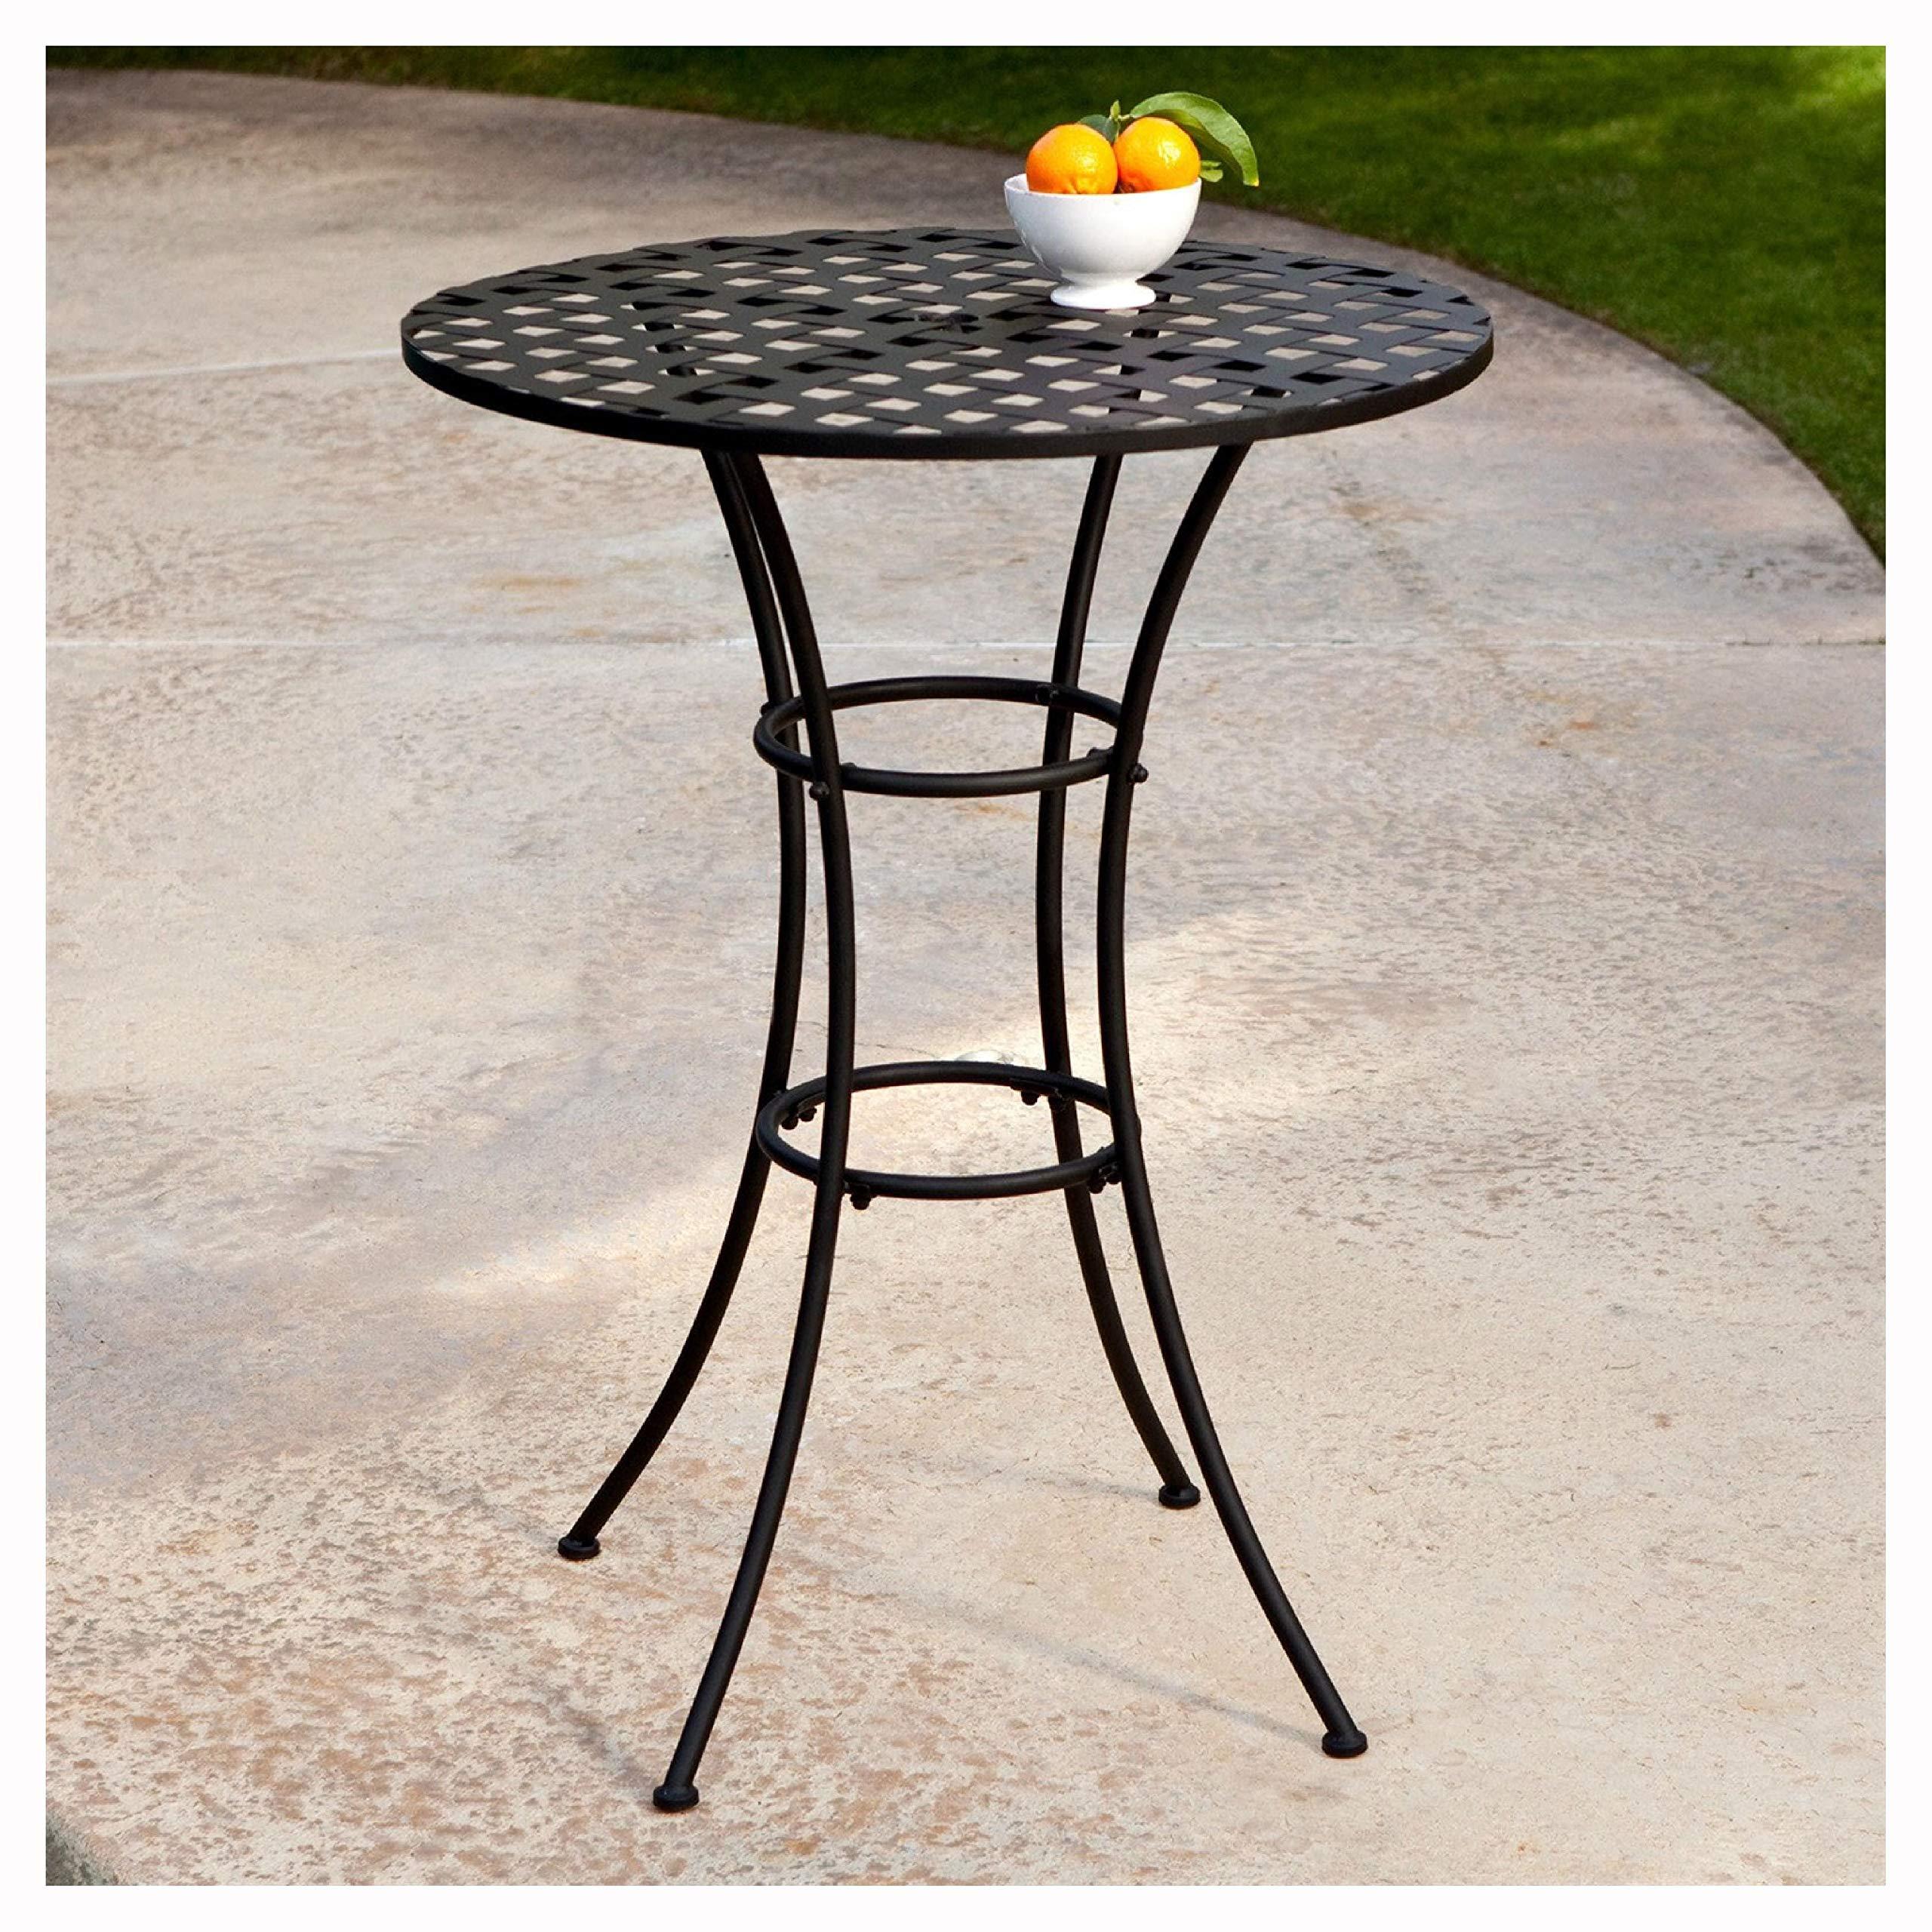 Black Wrought Iron Outdoor Bistro Patio Table with Timeless Round Table top, Black Wrought Iron Outdoor Bistro Patio Table with Timeless Round Tabletop by HEATAPPLY